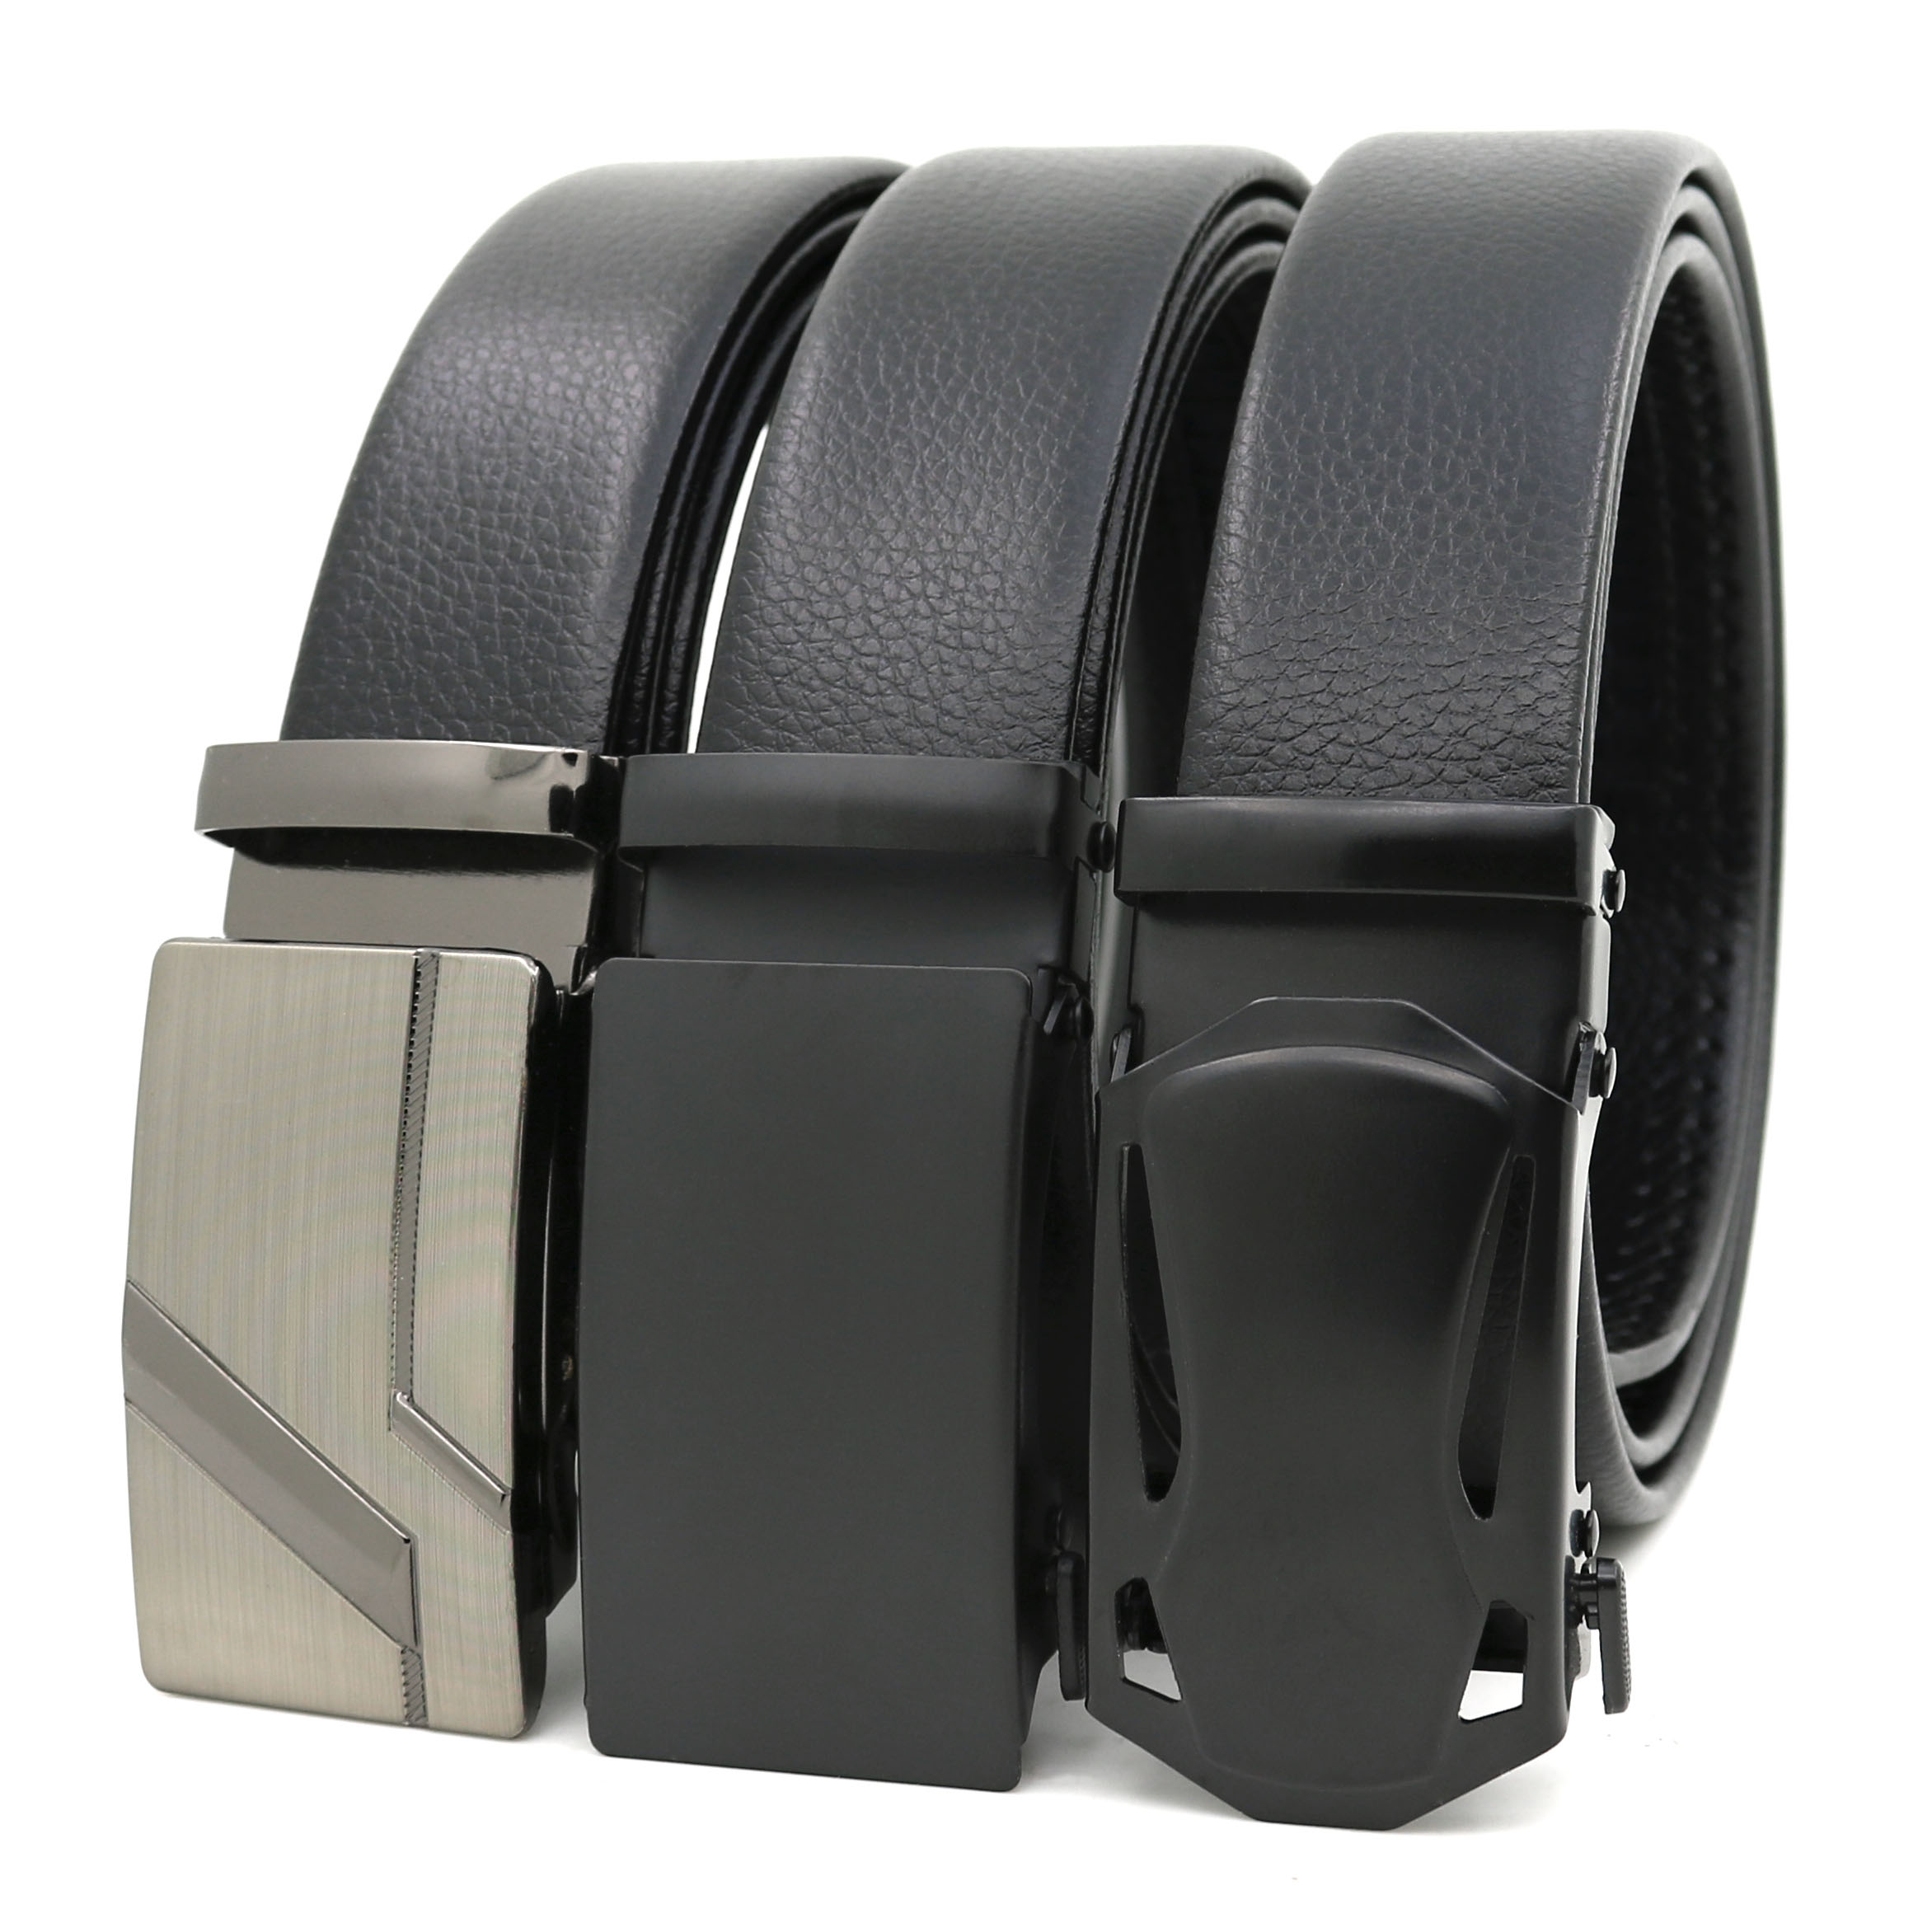 New Mens Automatic Buckle Belts Microfiber Durable PU Belts For Men Ratchet Belt Iron Buckle YiWu LQbelt Factory